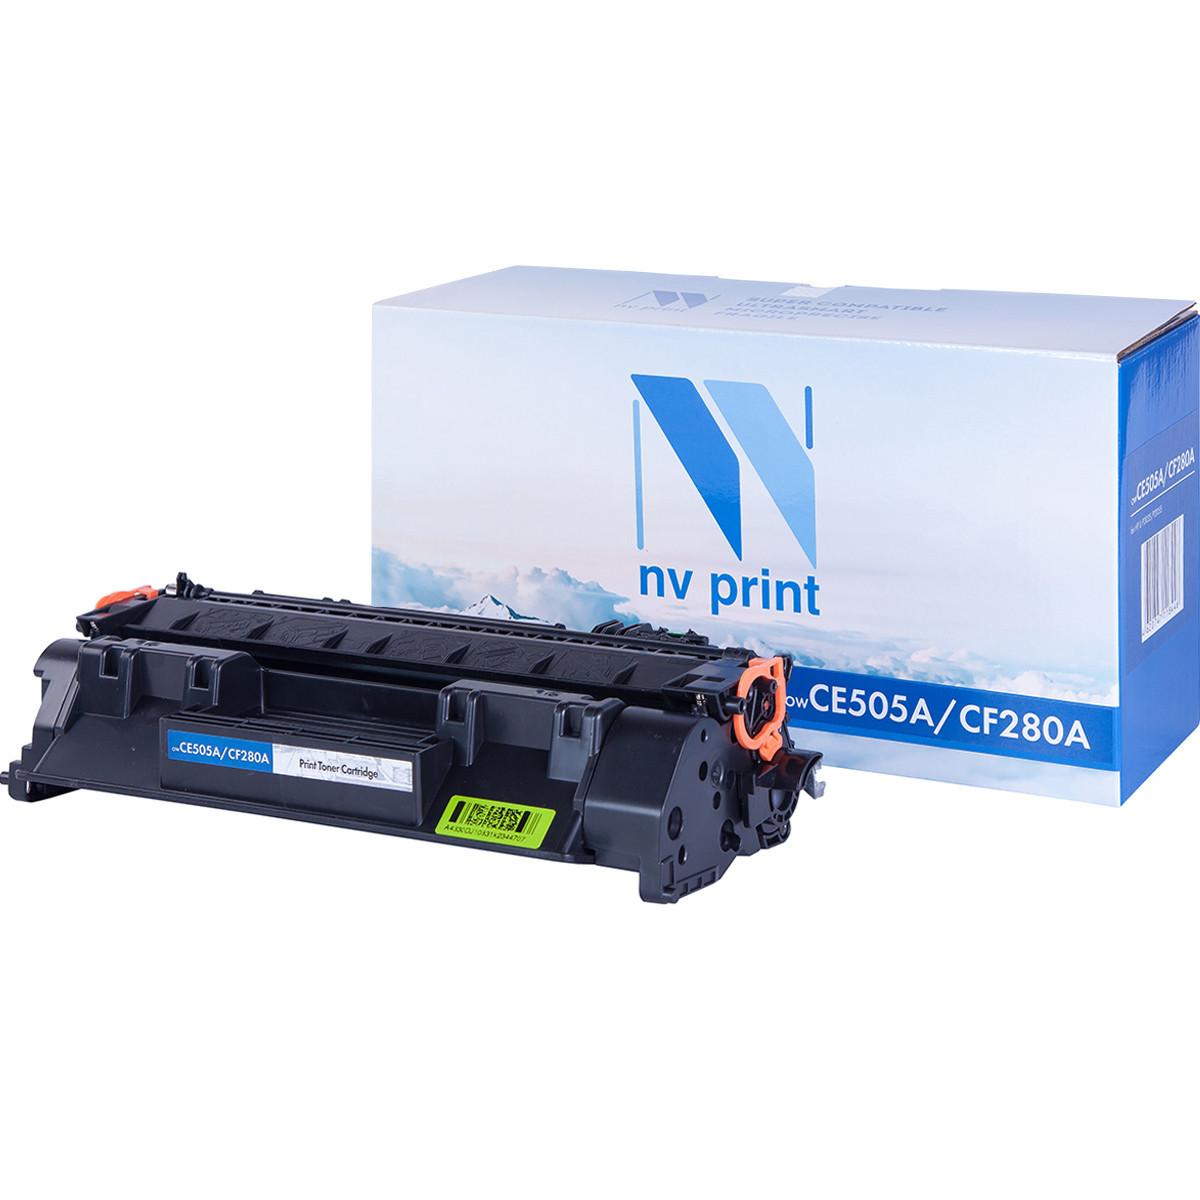 Картридж NVP совместимый HP CF280A/CE505A для LaserJet Pro